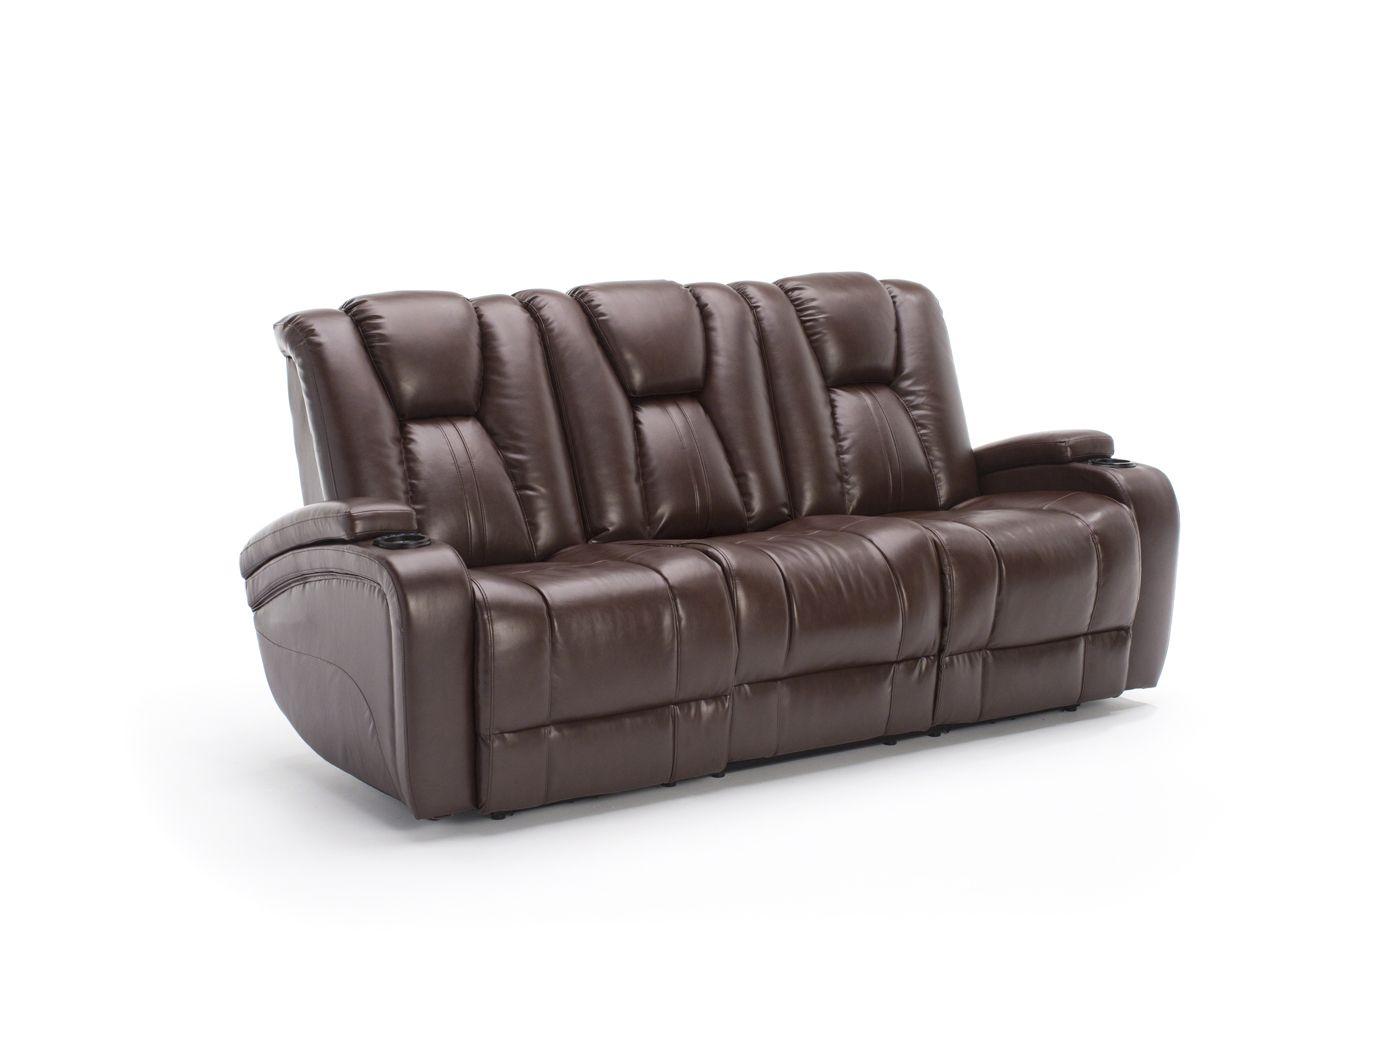 Thomas Cole Transformer Ii Brown Power Recline Sofa